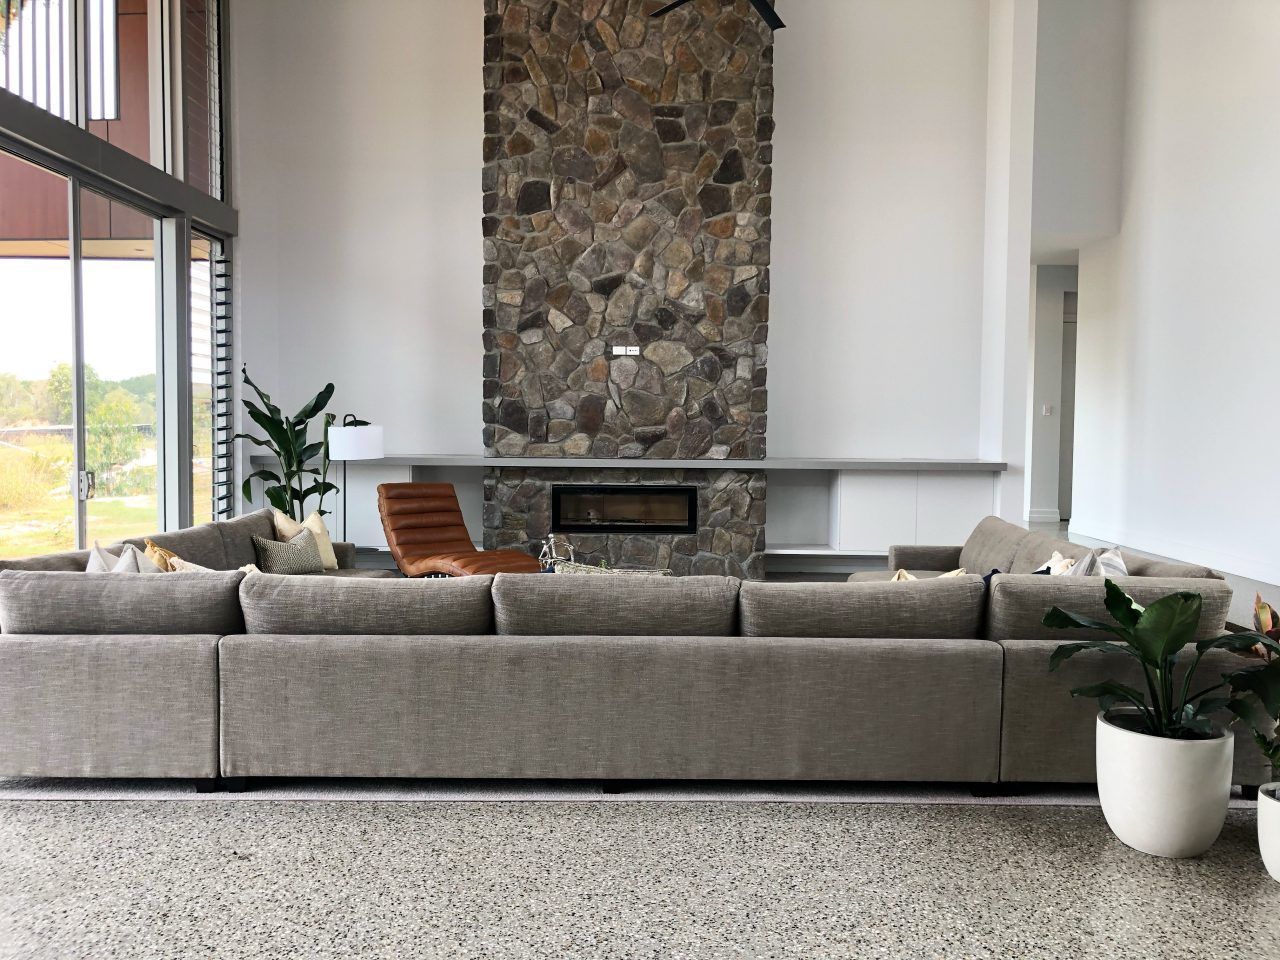 Interior-Design-Redland-Bay-Fire-Place-1280x960.jpeg